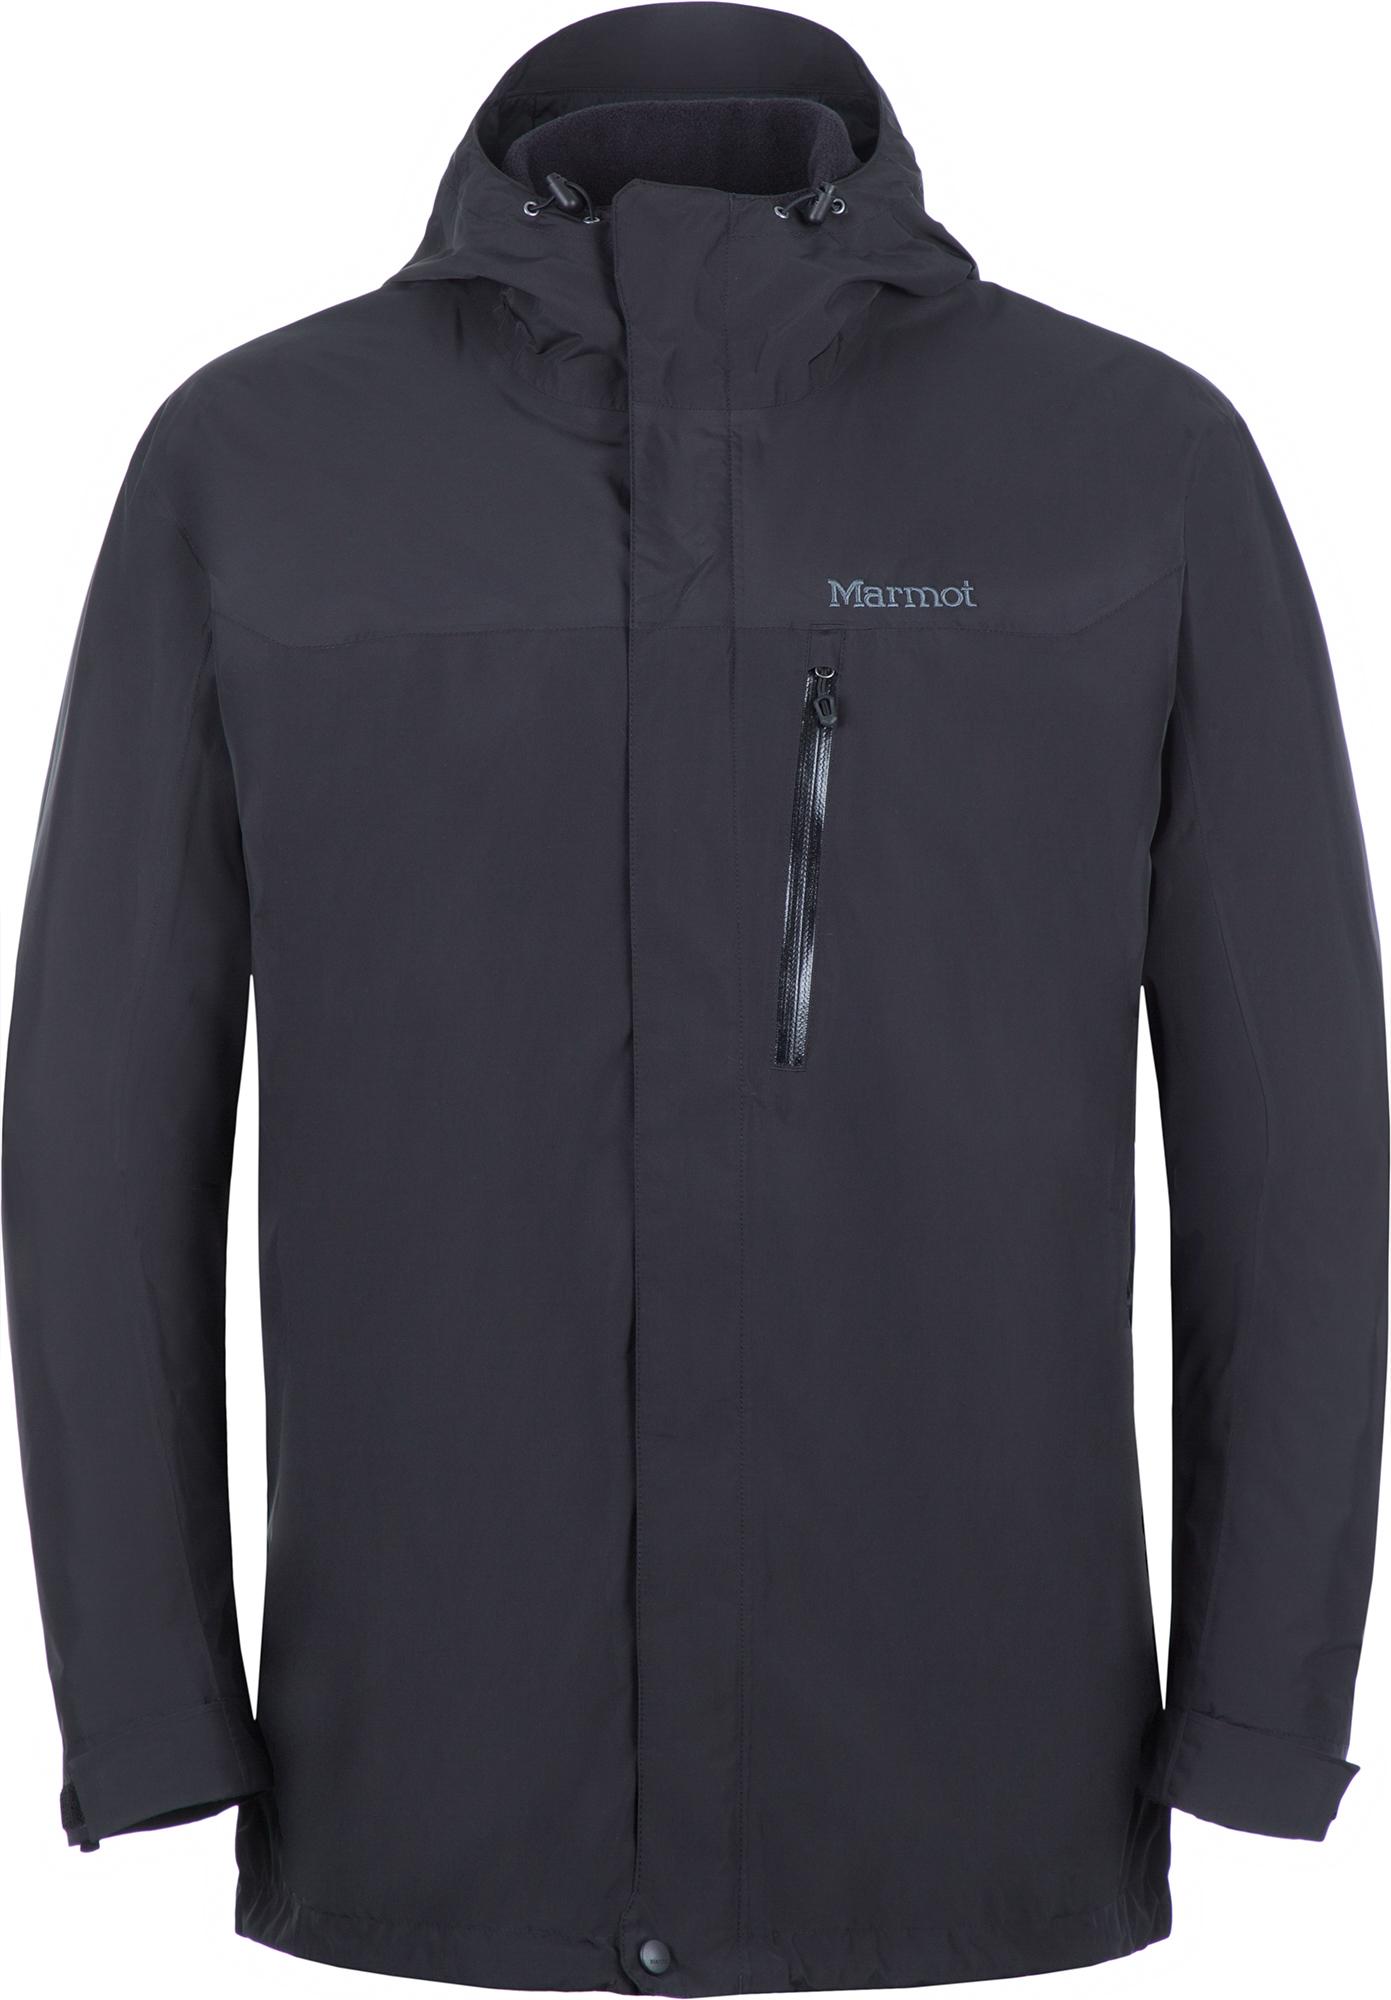 Marmot Куртка 3 в 1 мужская Marmot Ramble Component, размер 60-62 куртка мужская reebok f puff bomber цвет черный dh2140 размер xxl 60 62